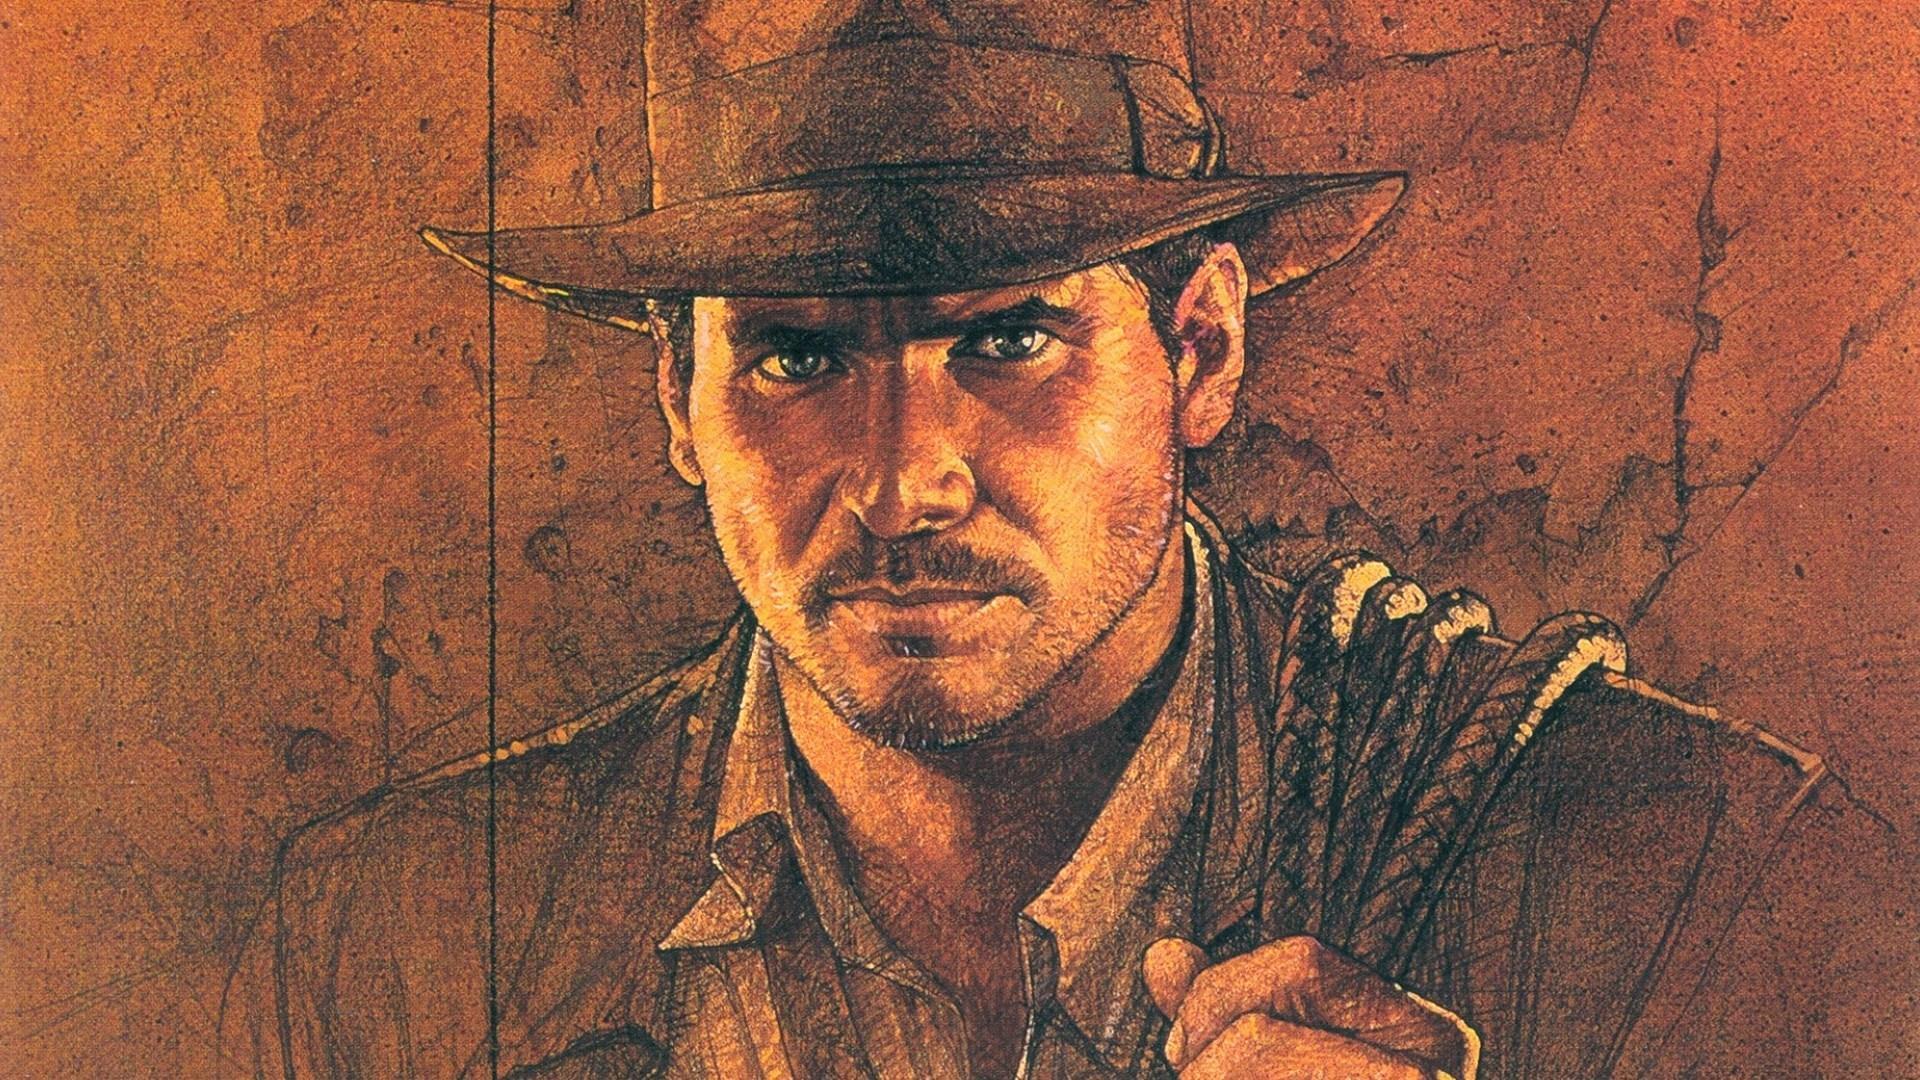 Un mashup tra Indiana Jones e Jason Bourne